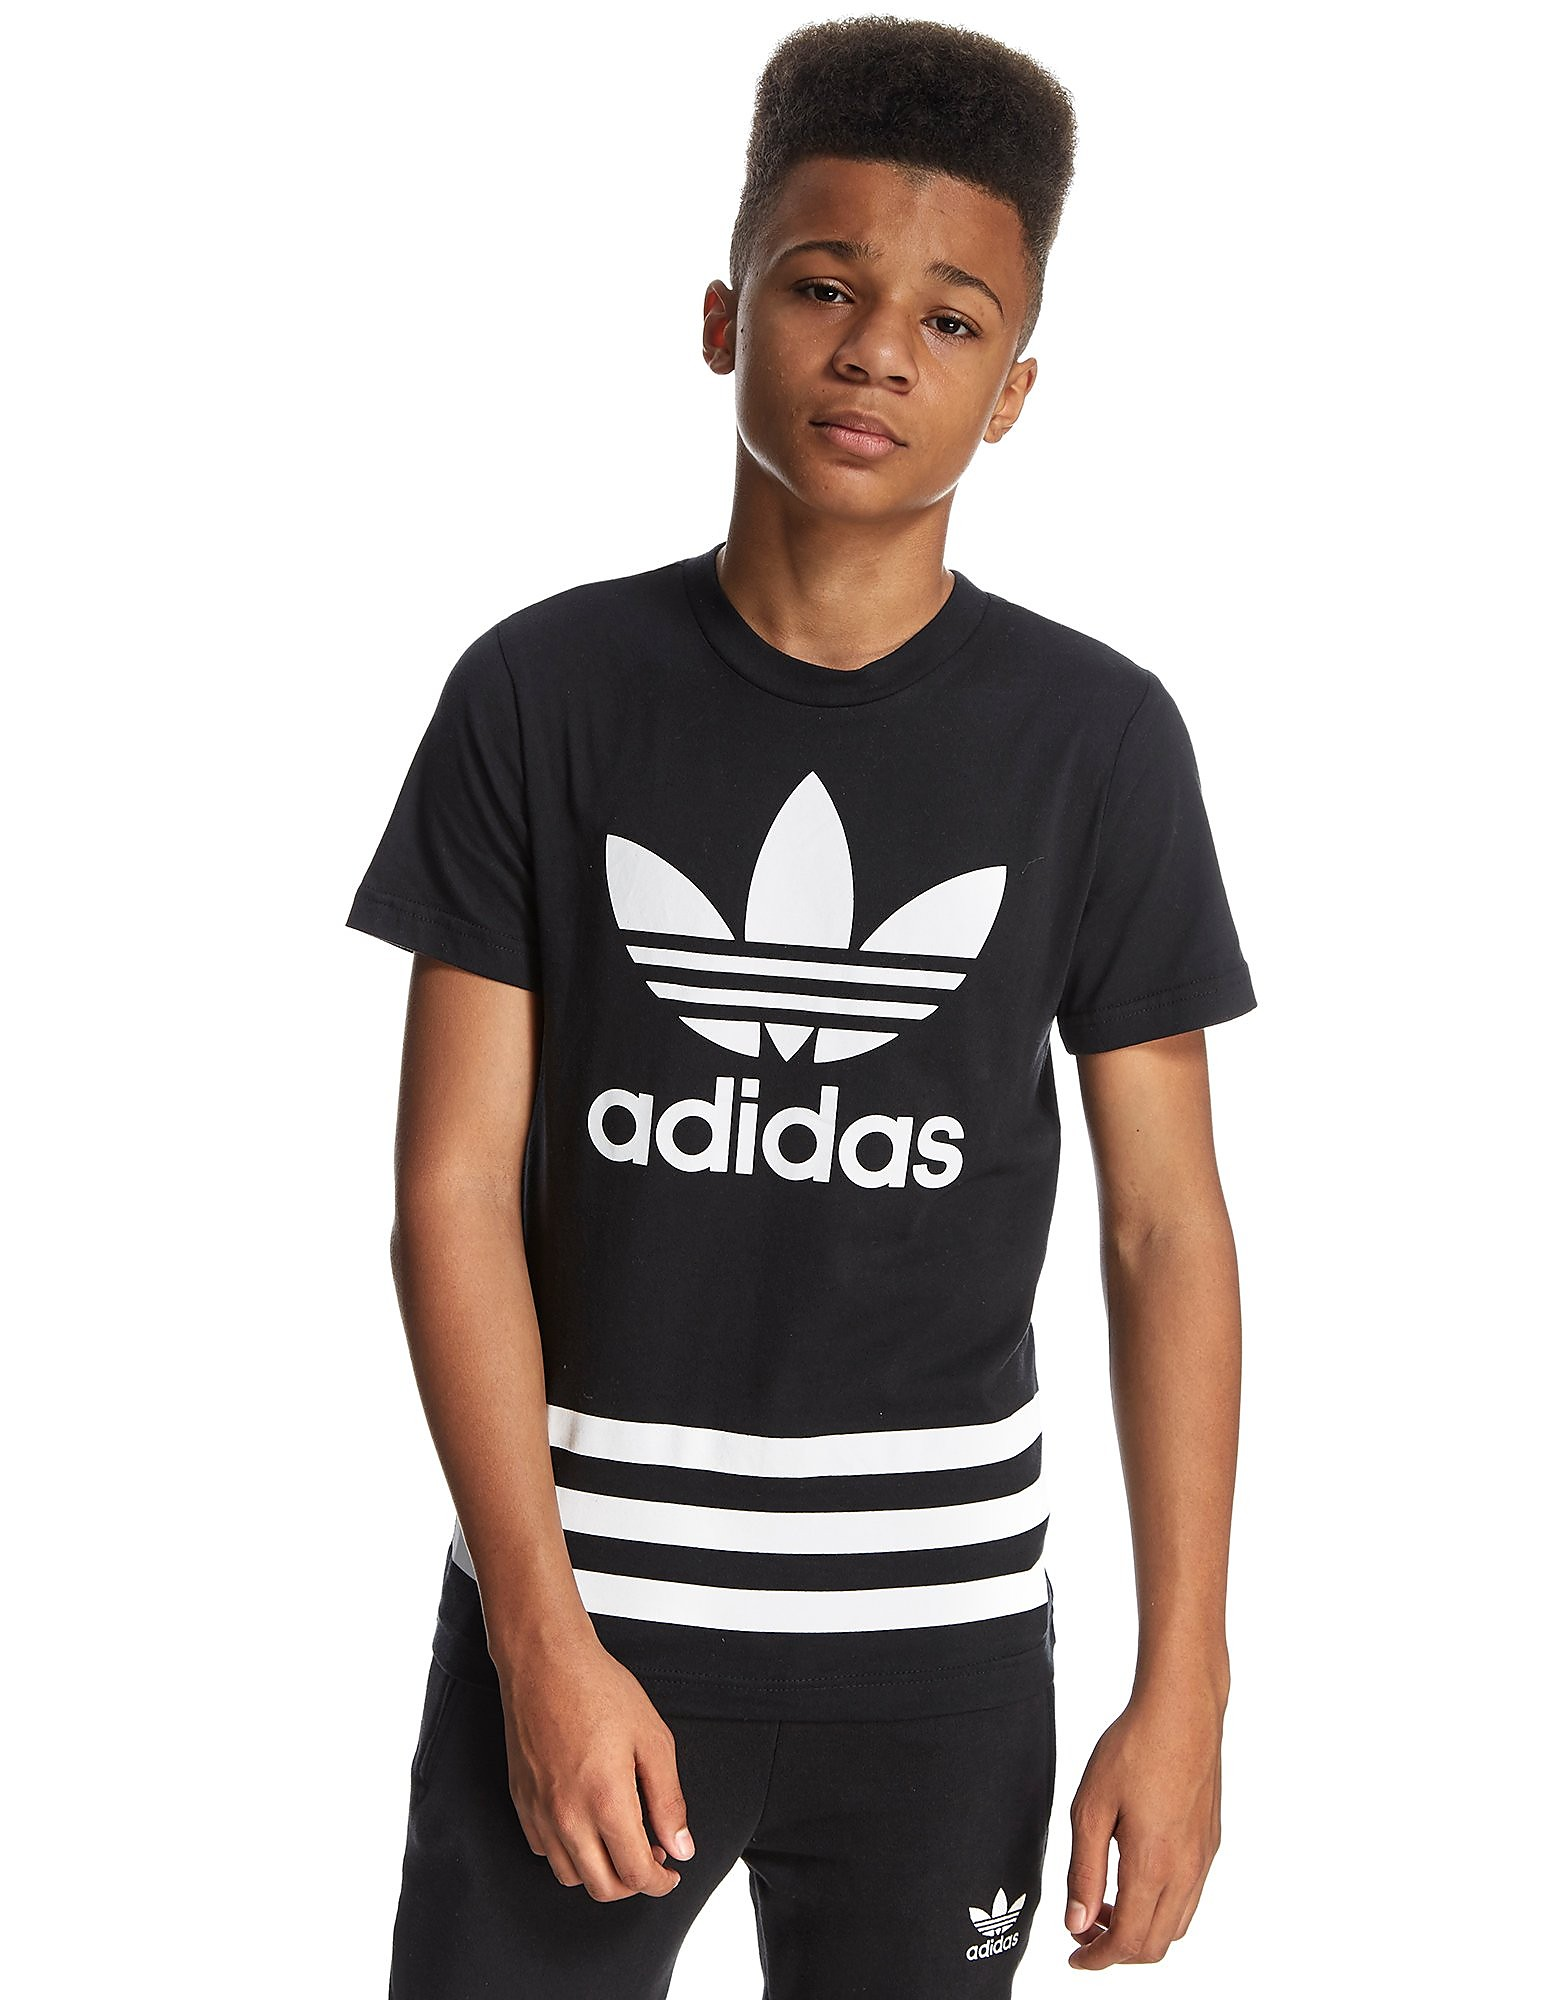 adidas Originals Street T-Shirt Junior